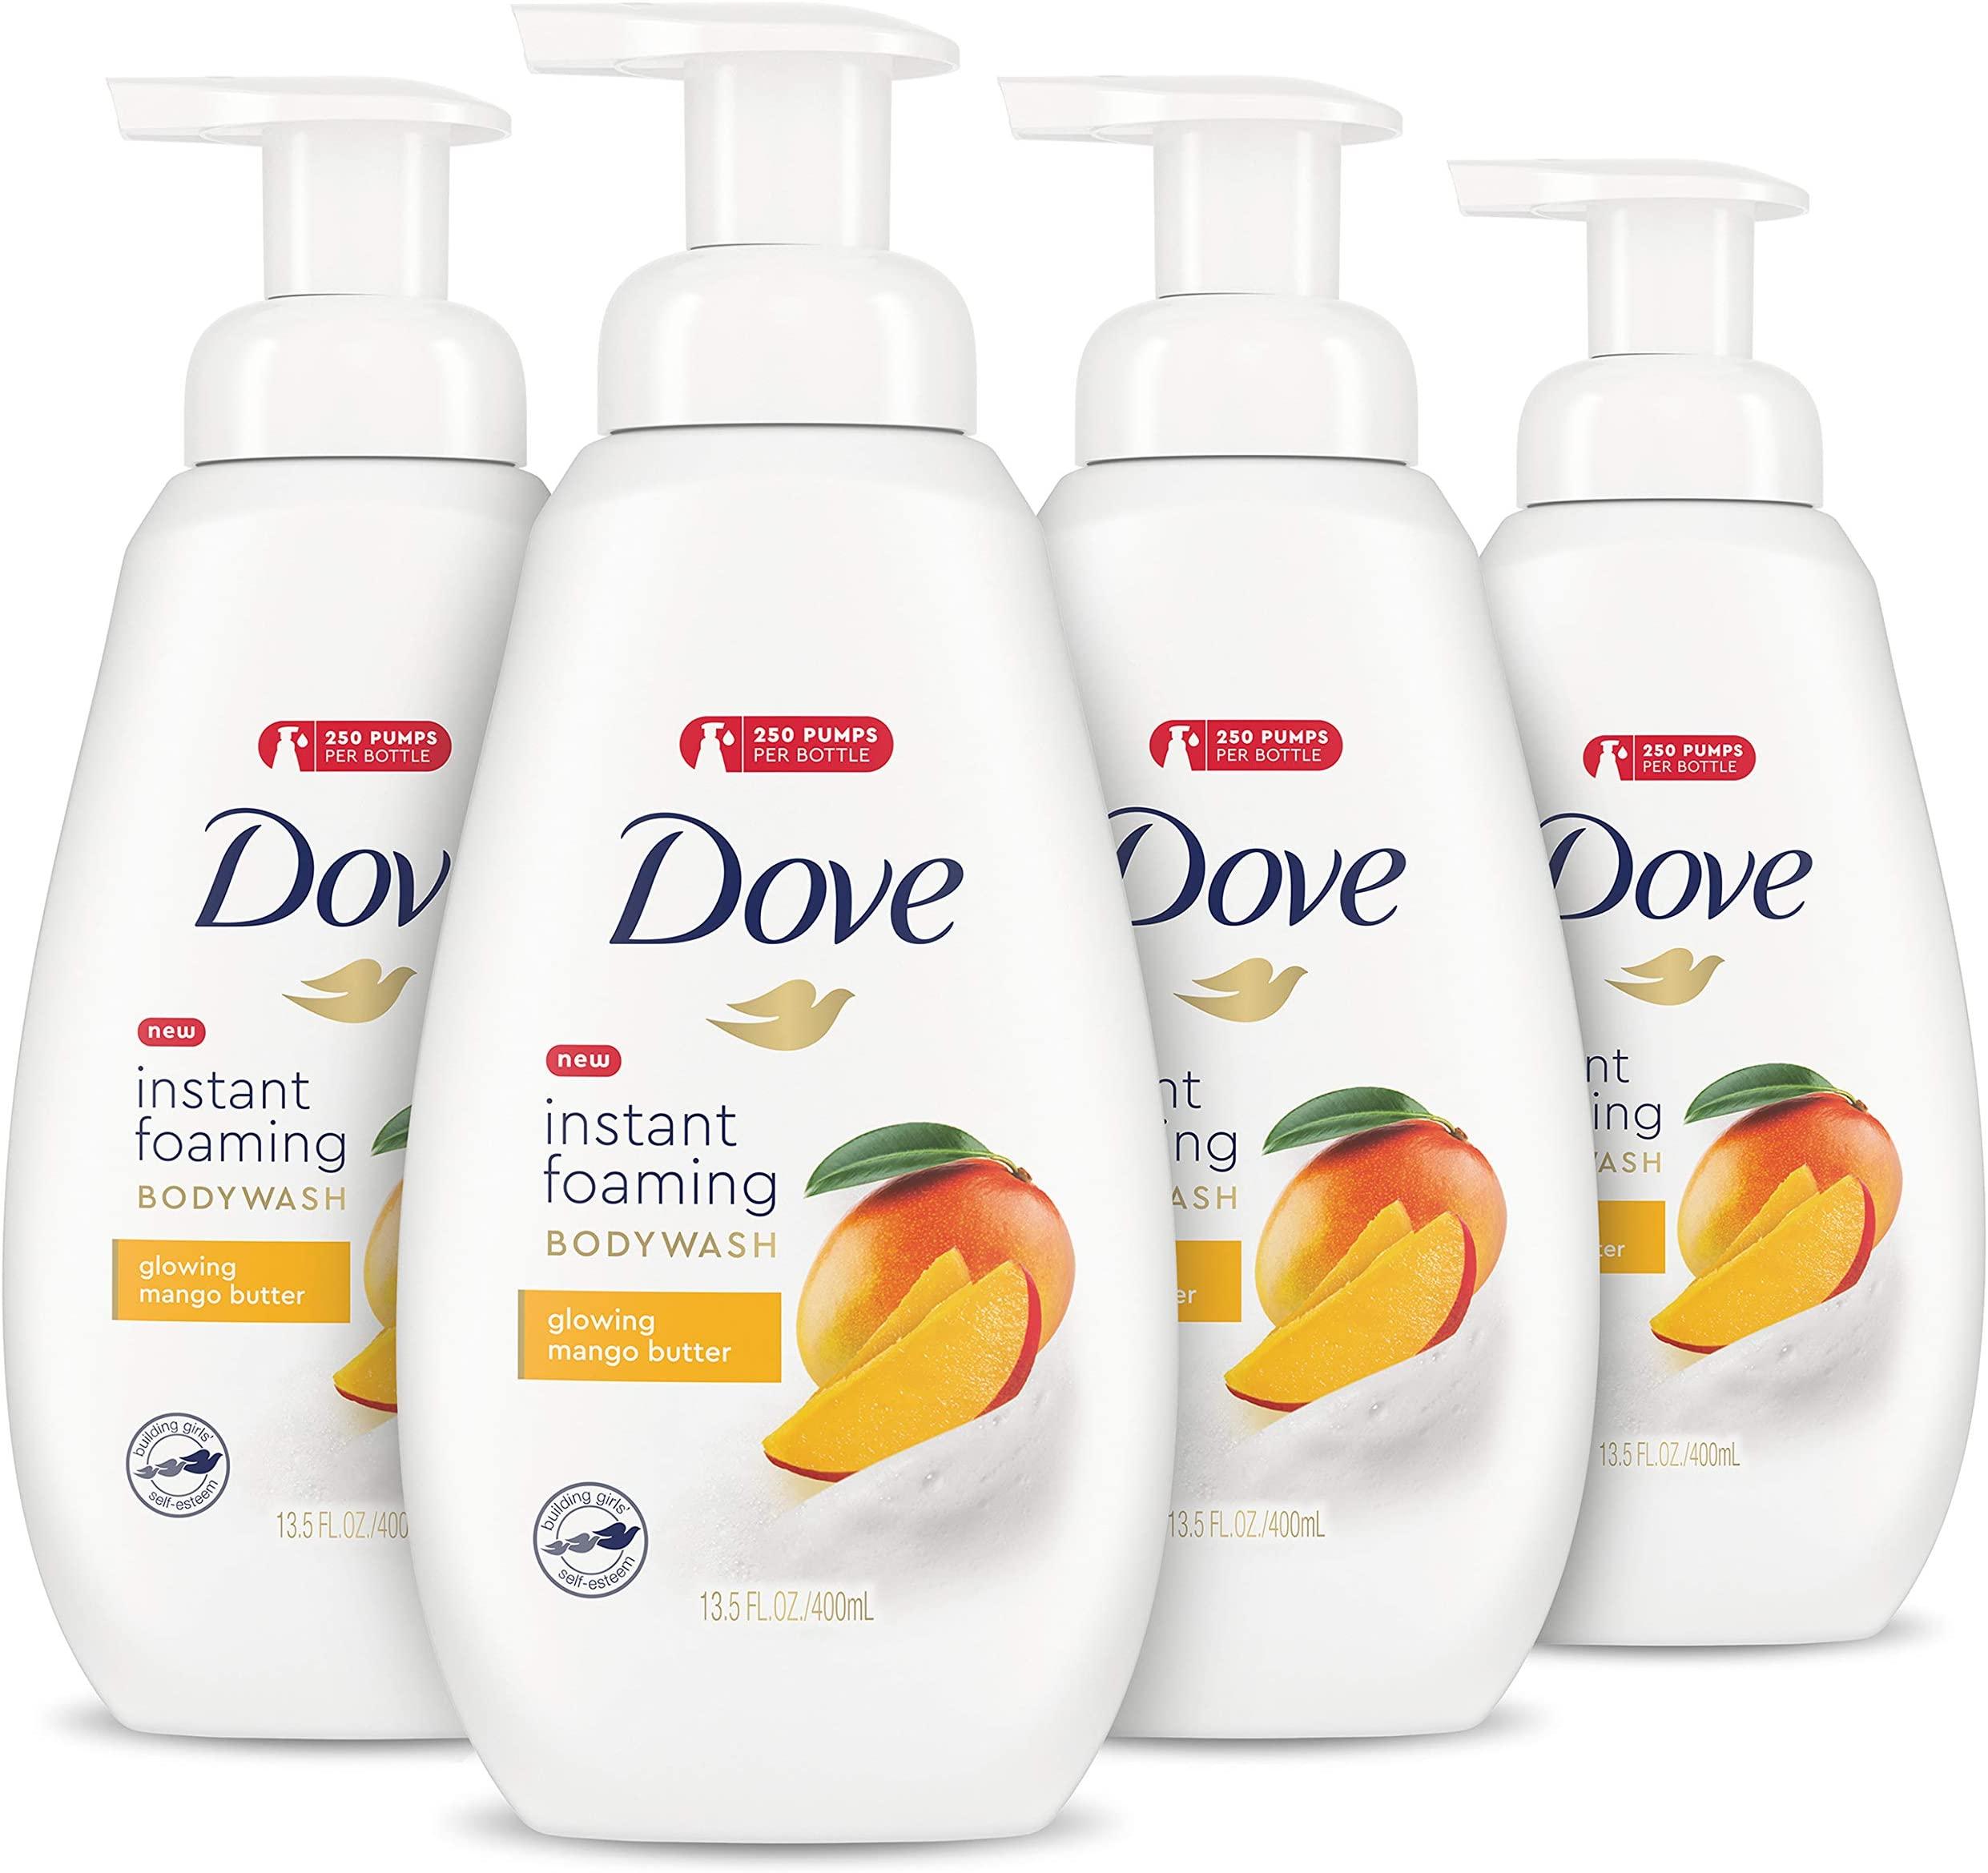 4 Pack - Dove Foaming Body Wash (Mango Butter) $15.94 @ Amazon